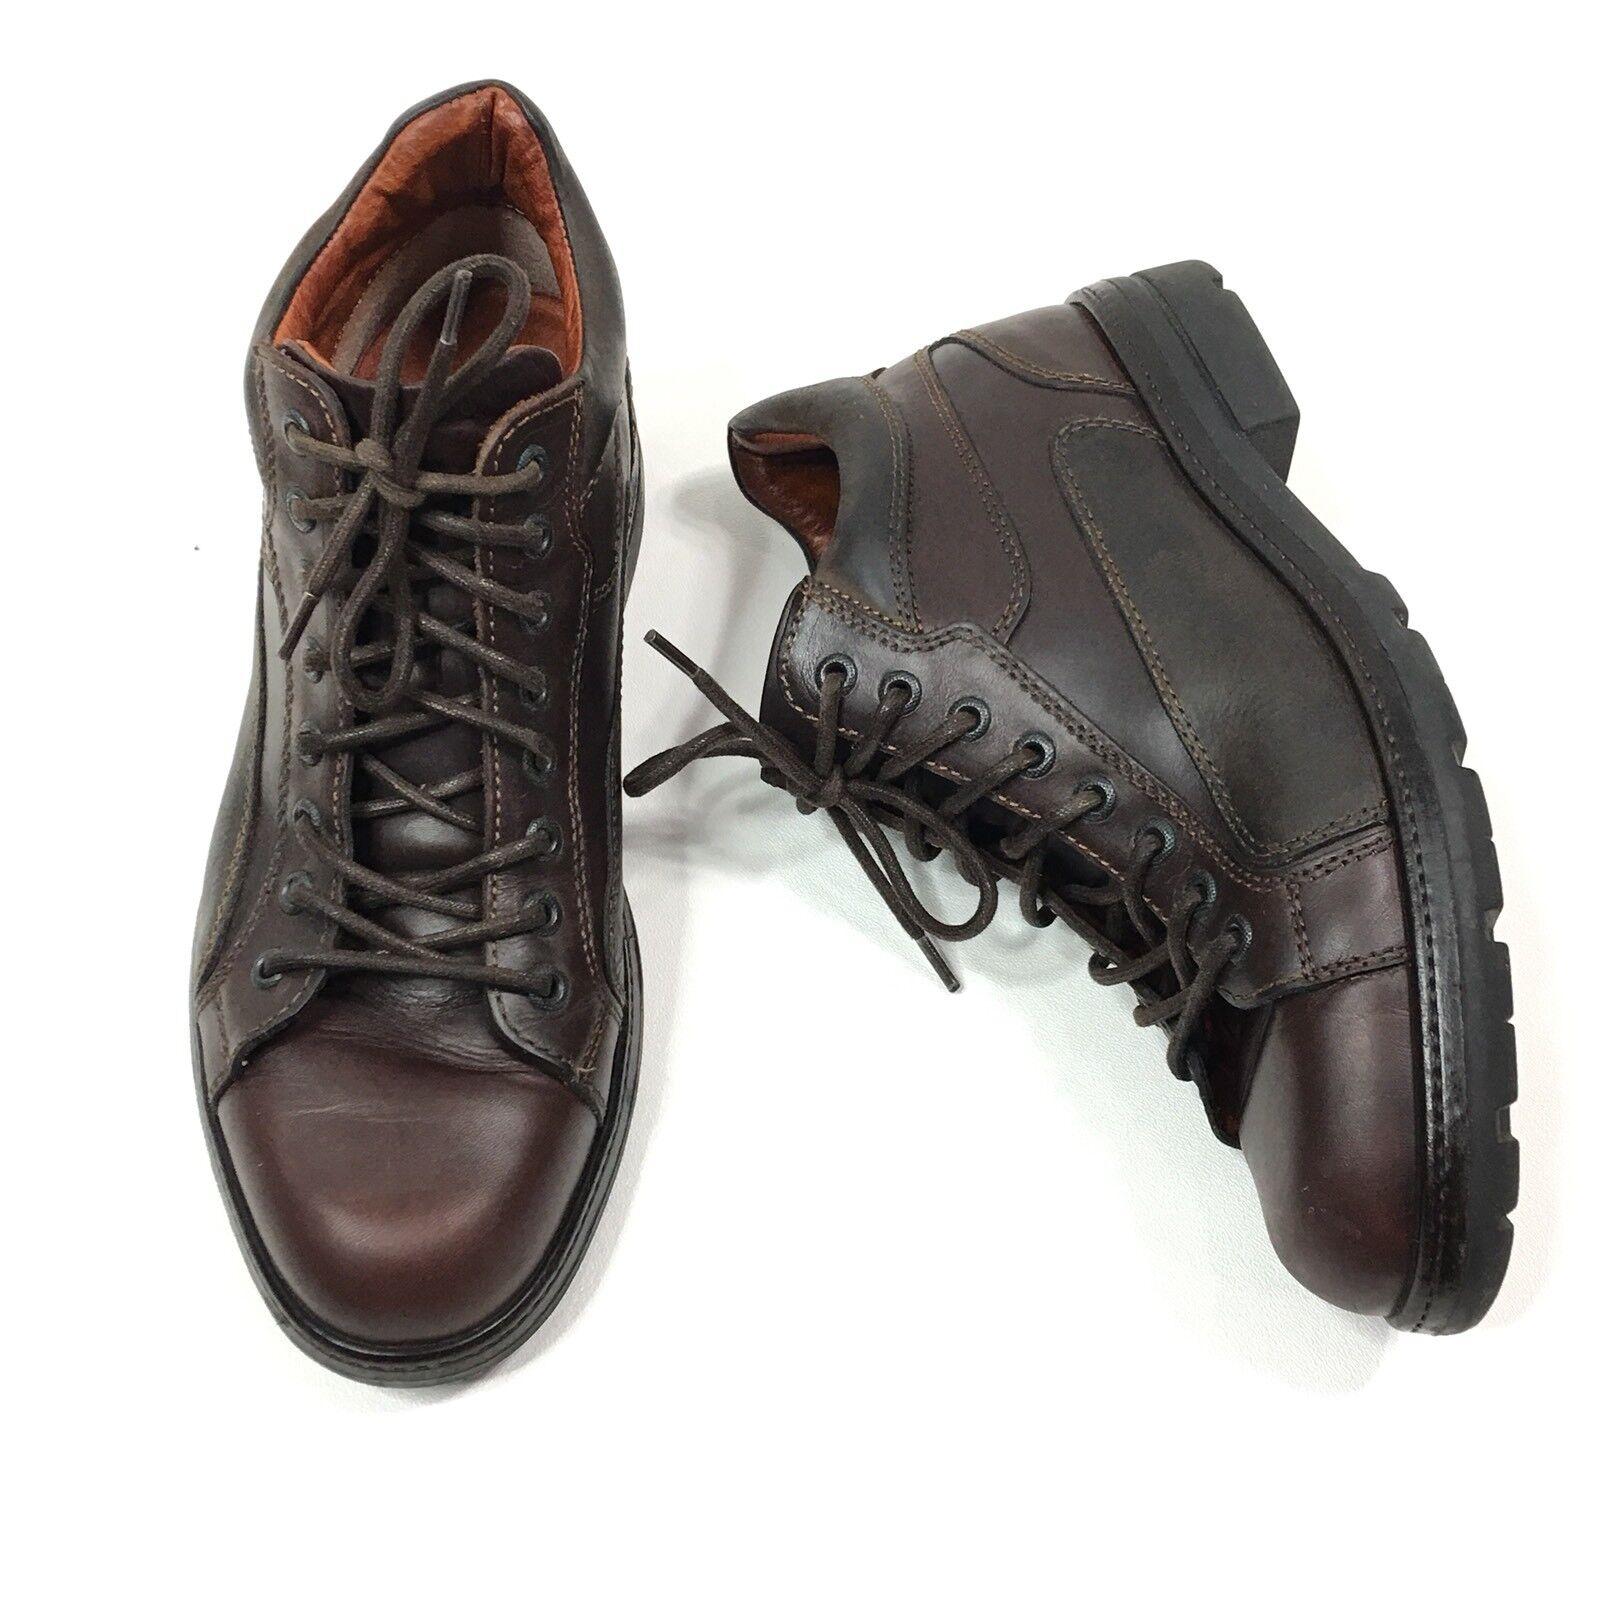 Johnston & Murphy 20-7924 Mens braun Leather Cap Toe Ankle Lace Up Stiefel Sz 8 M